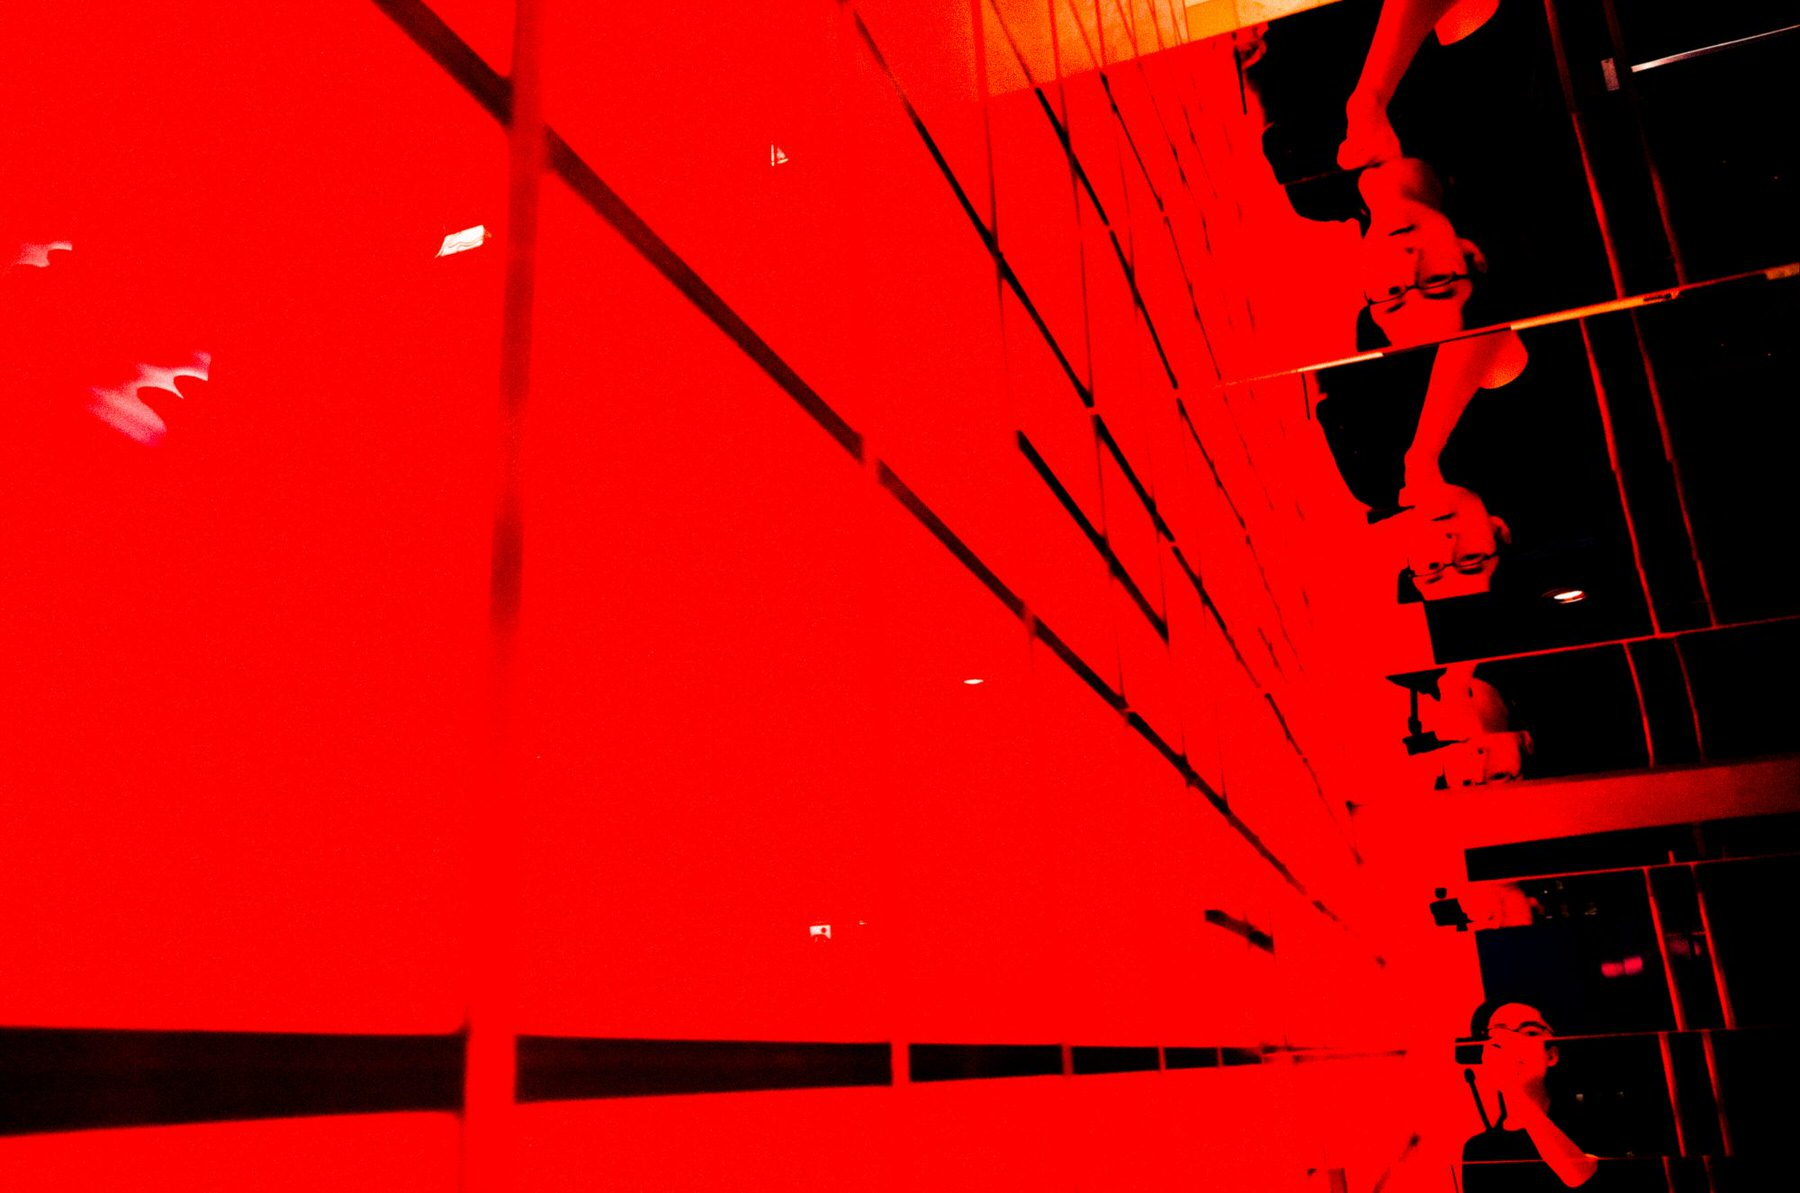 eric kim red ricoh selfie bape store reflection .jpeg